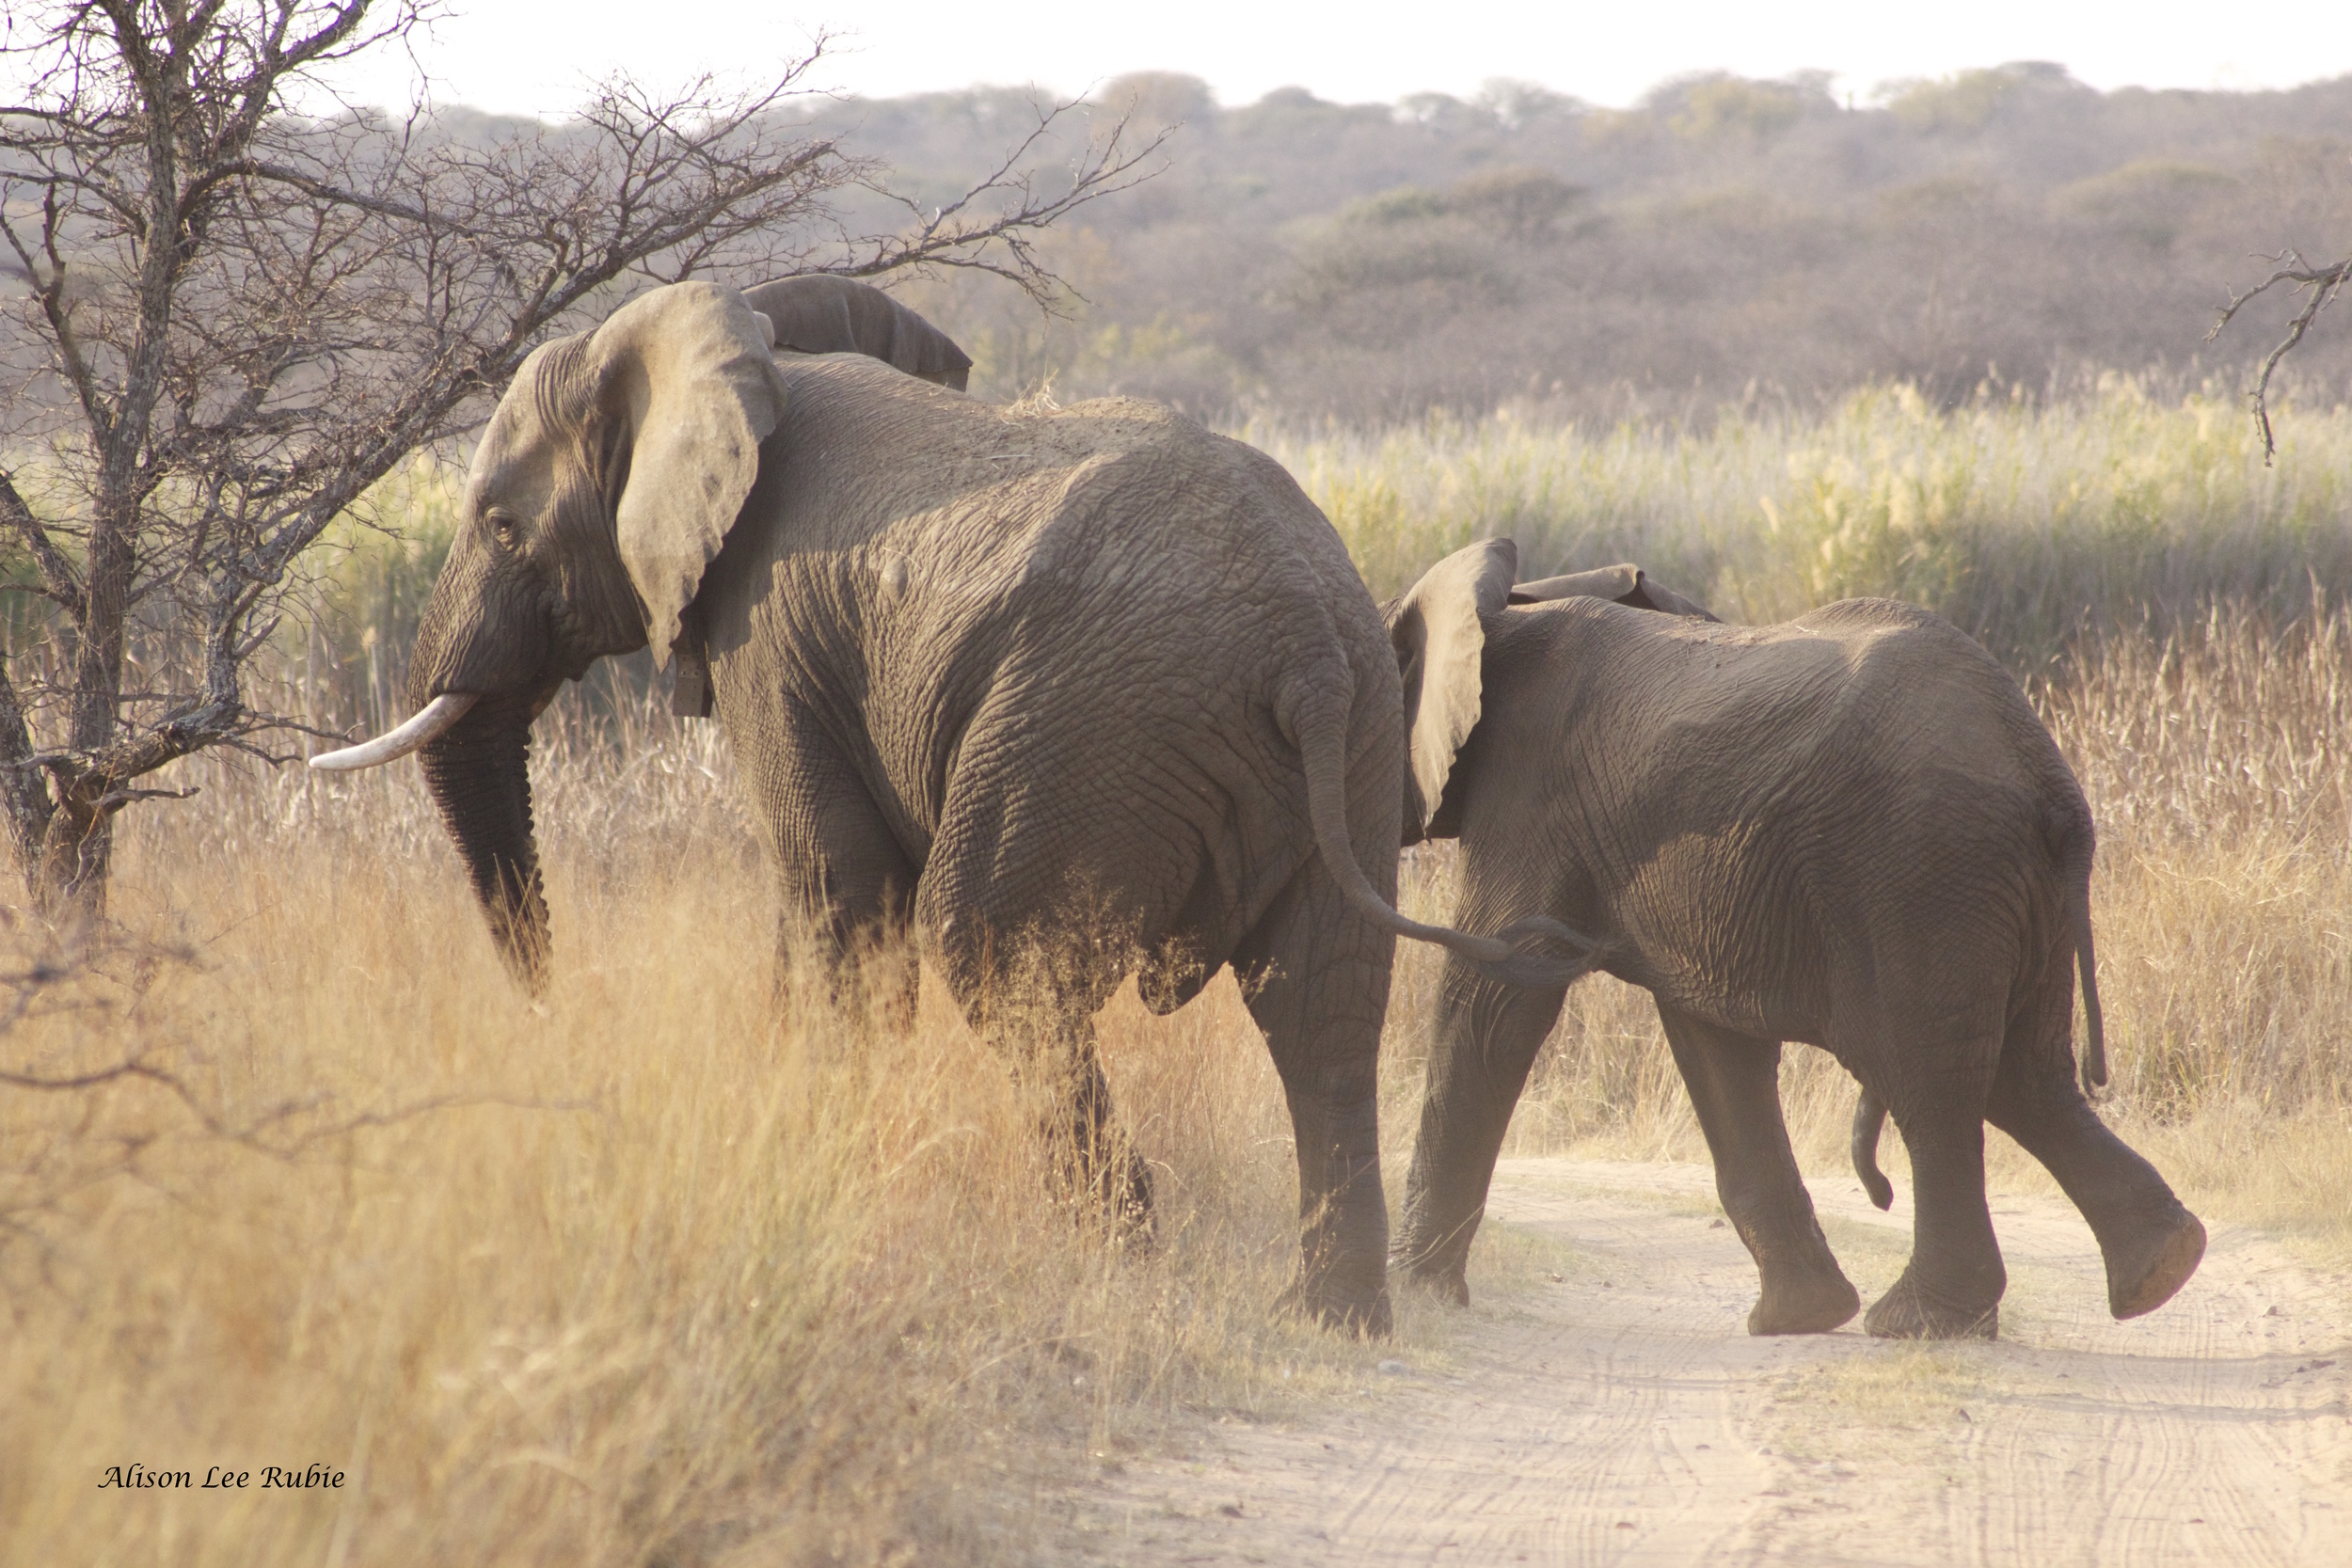 Mighty elephants